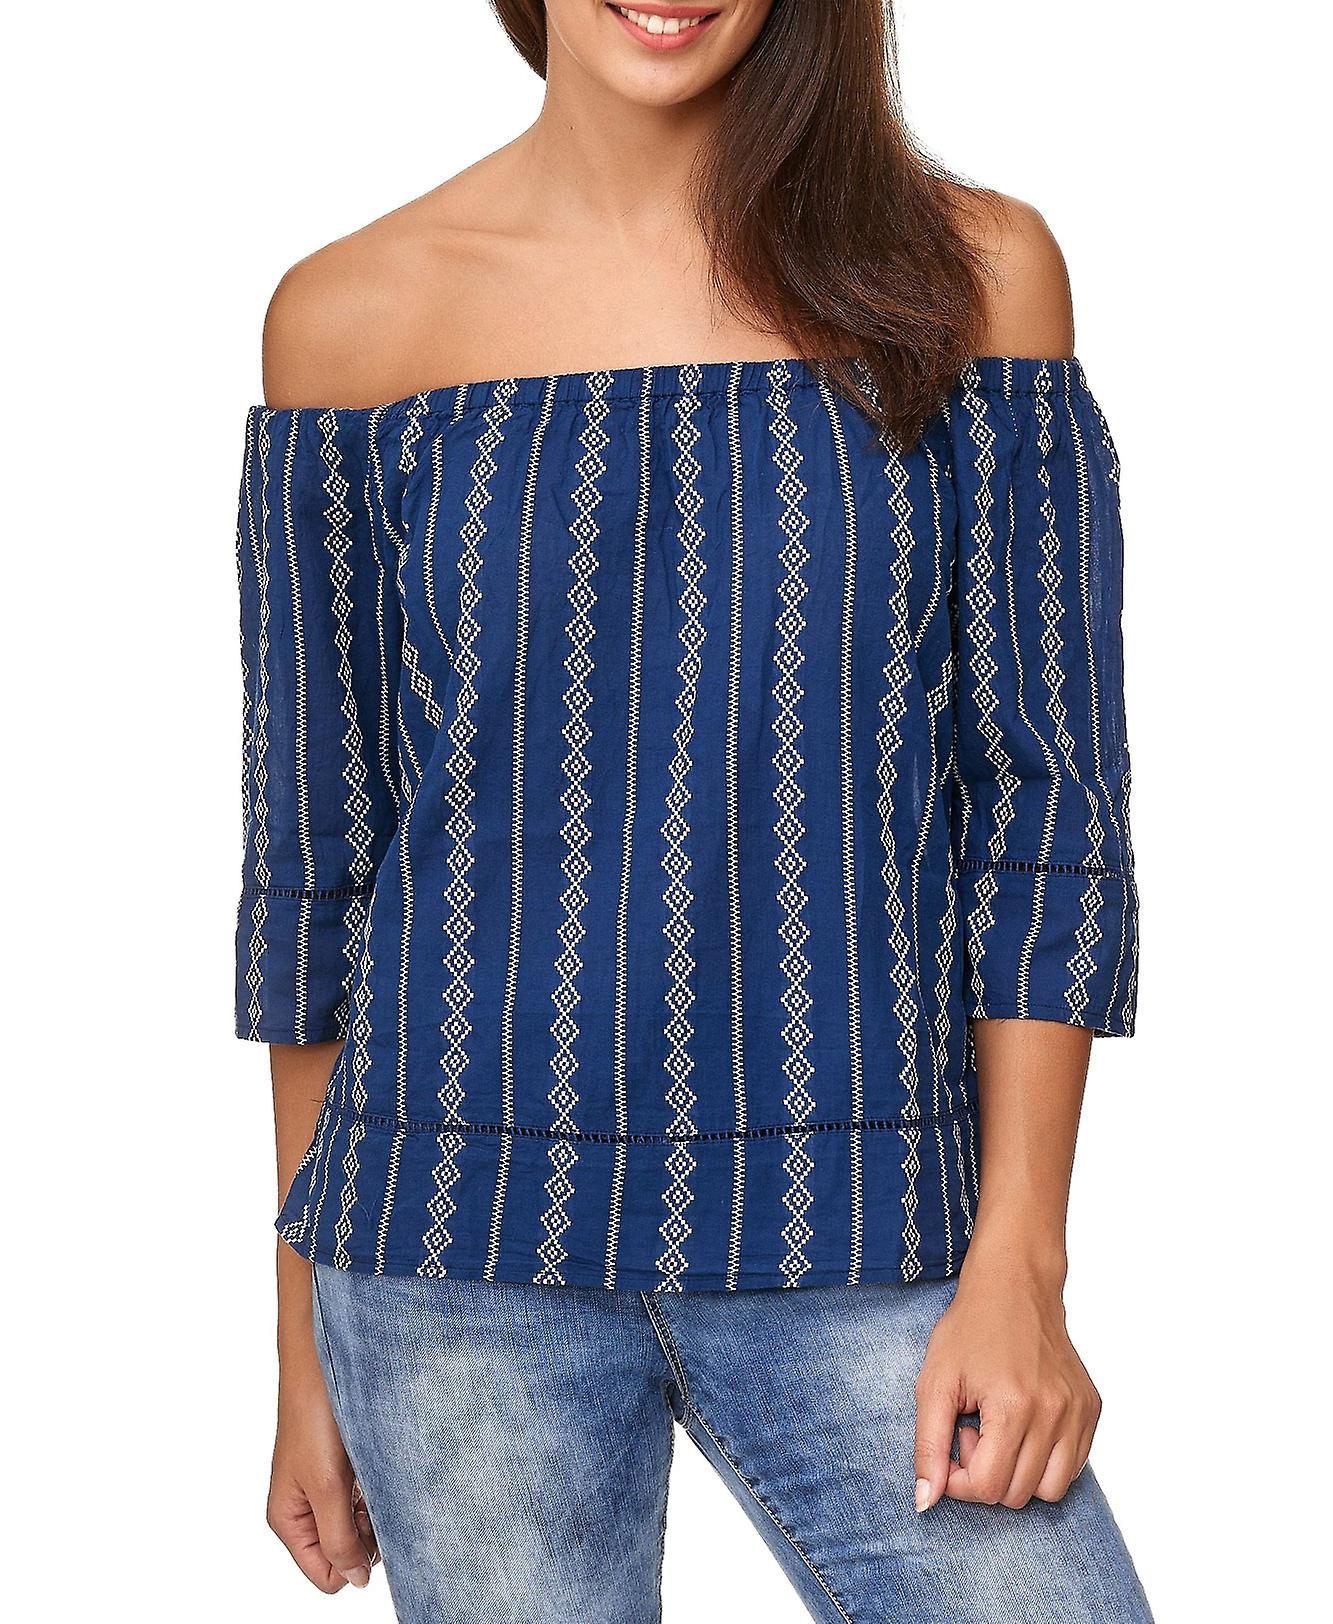 c052ff24d17df4 JDY Ladie s Shirt Carmen Neckline Off Shoulder Top Blouses 3 4 Sleeves  Women s